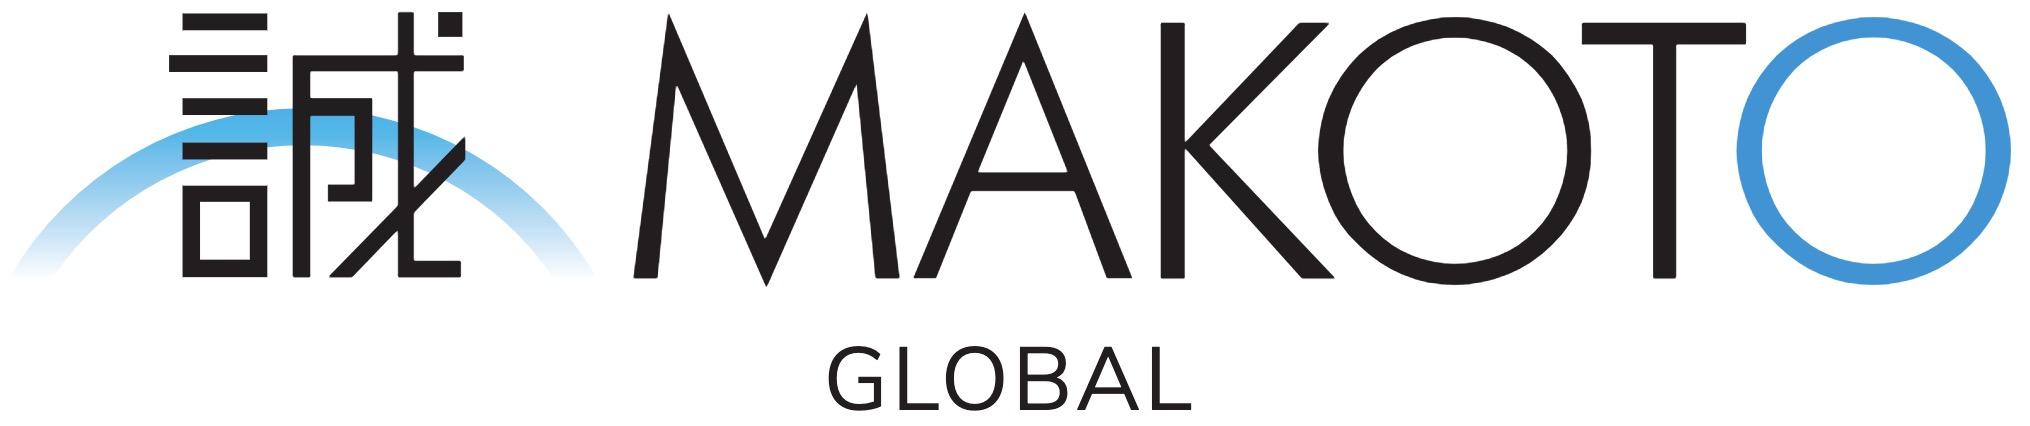 Makoto Global Logo